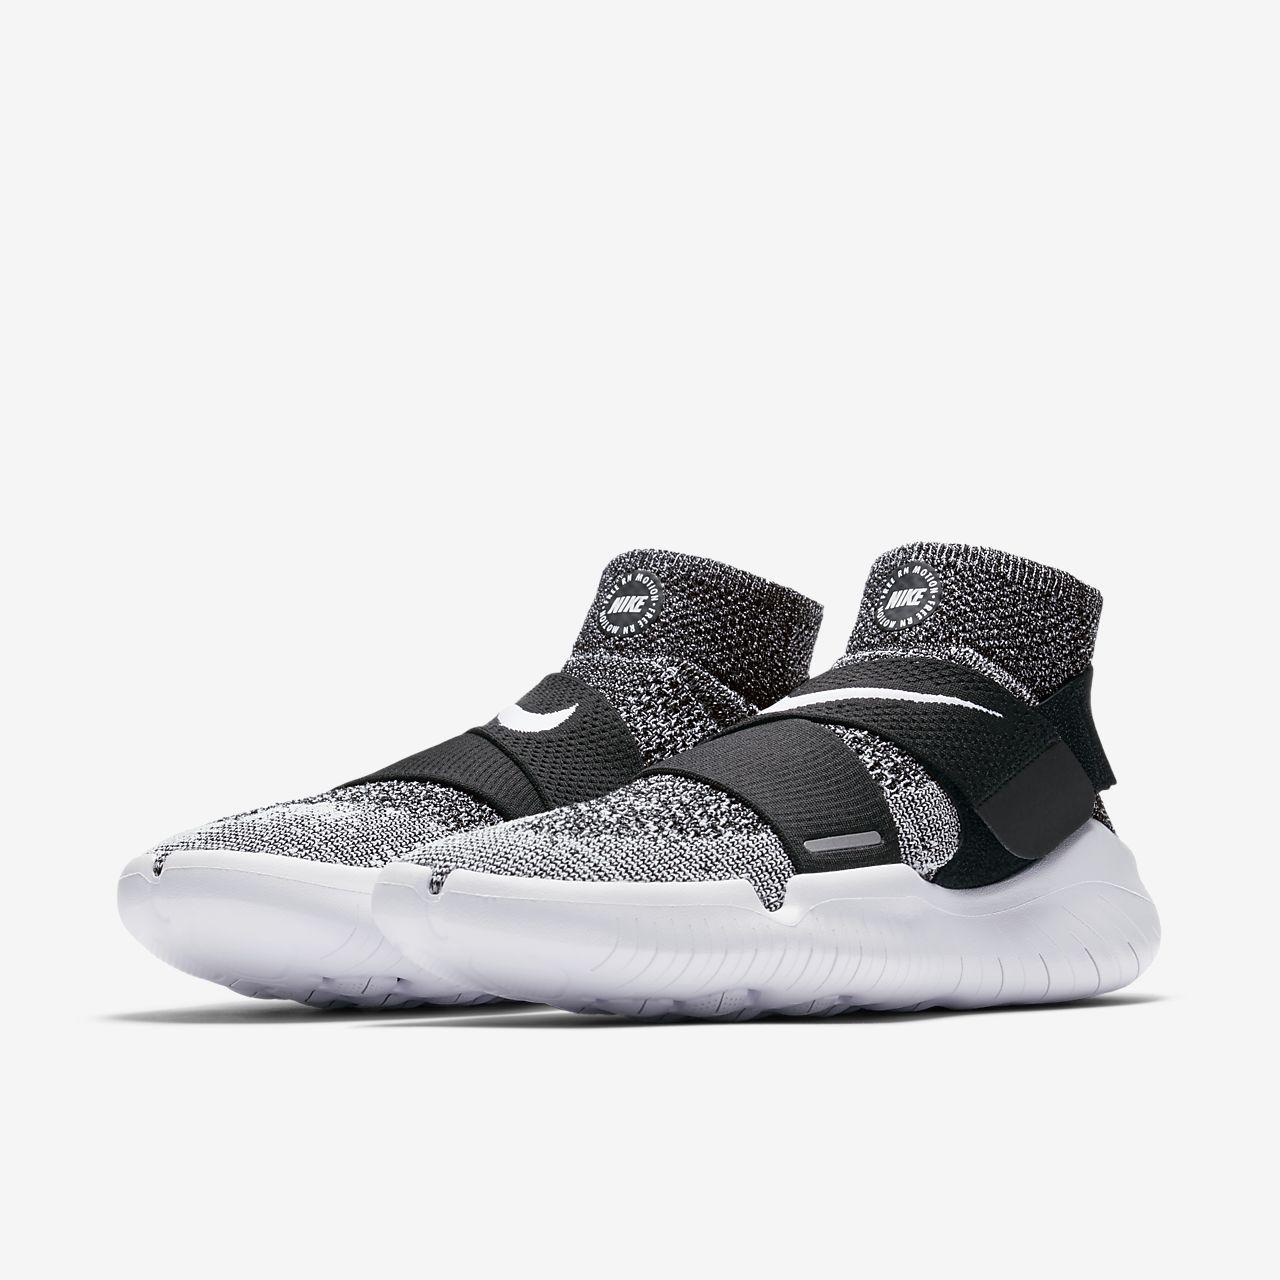 ... Nike Free RN Motion Flyknit 2018 Men's Running Shoe